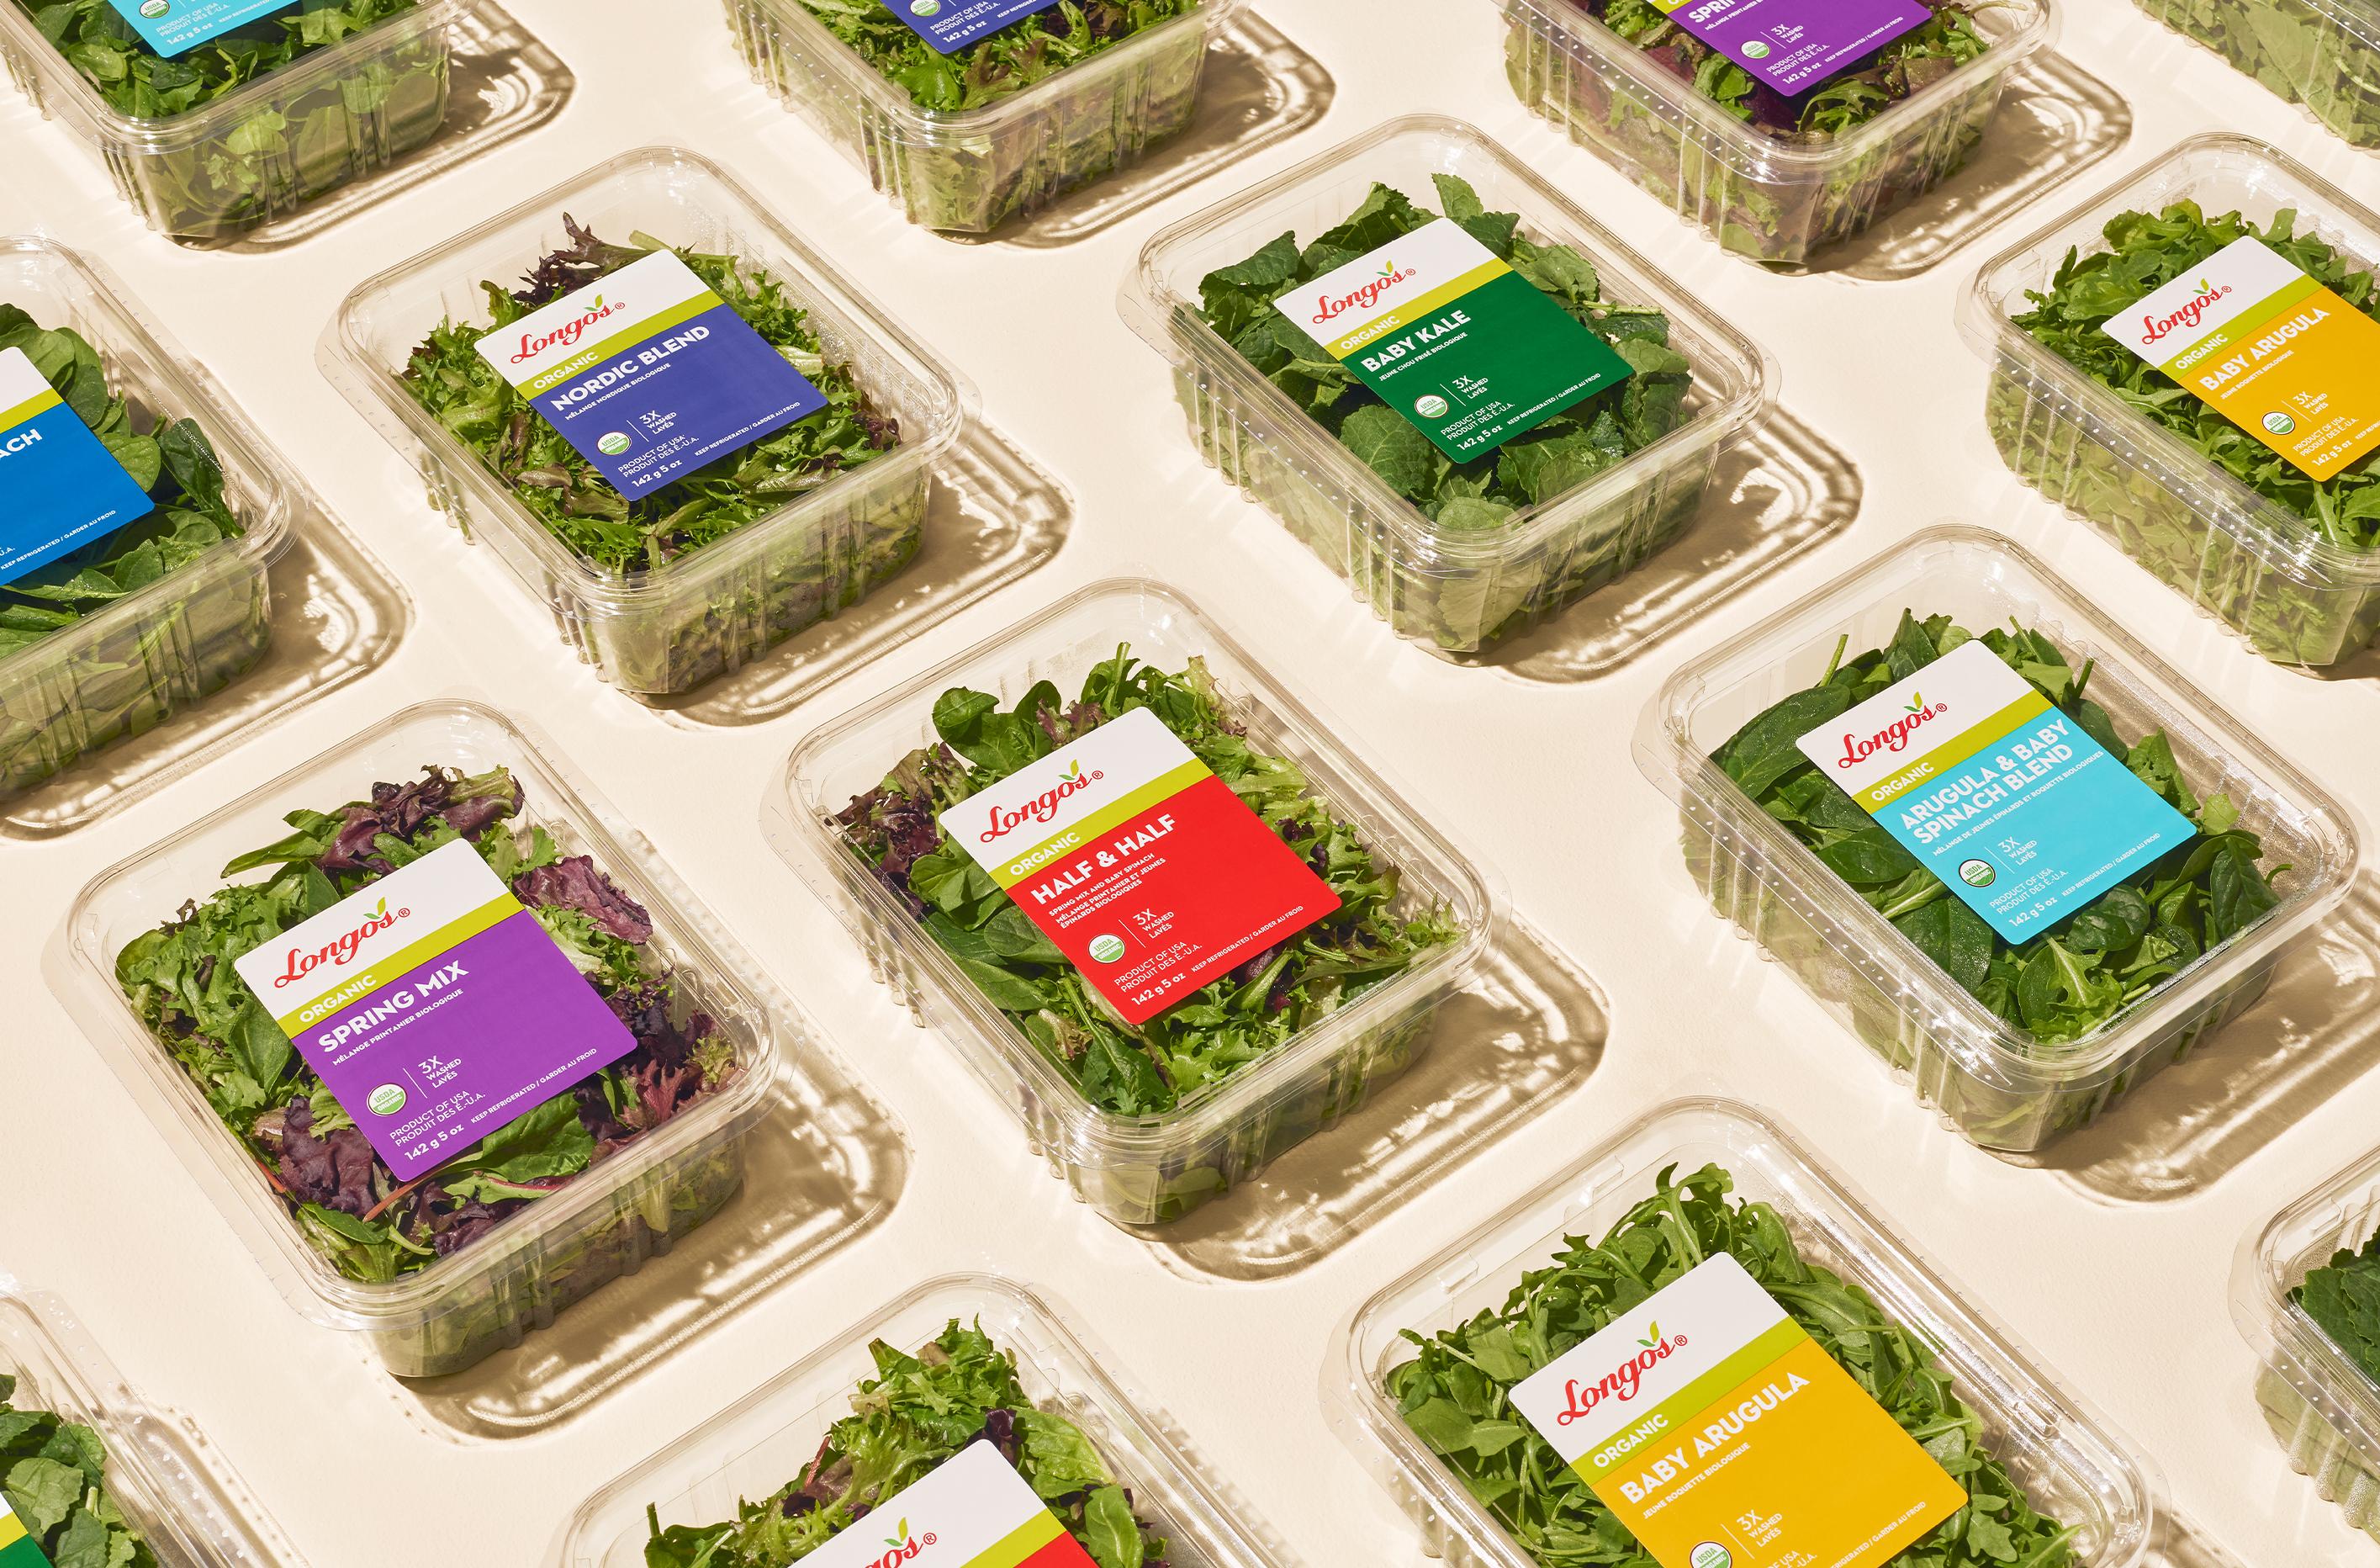 Longos-Private Label Salads